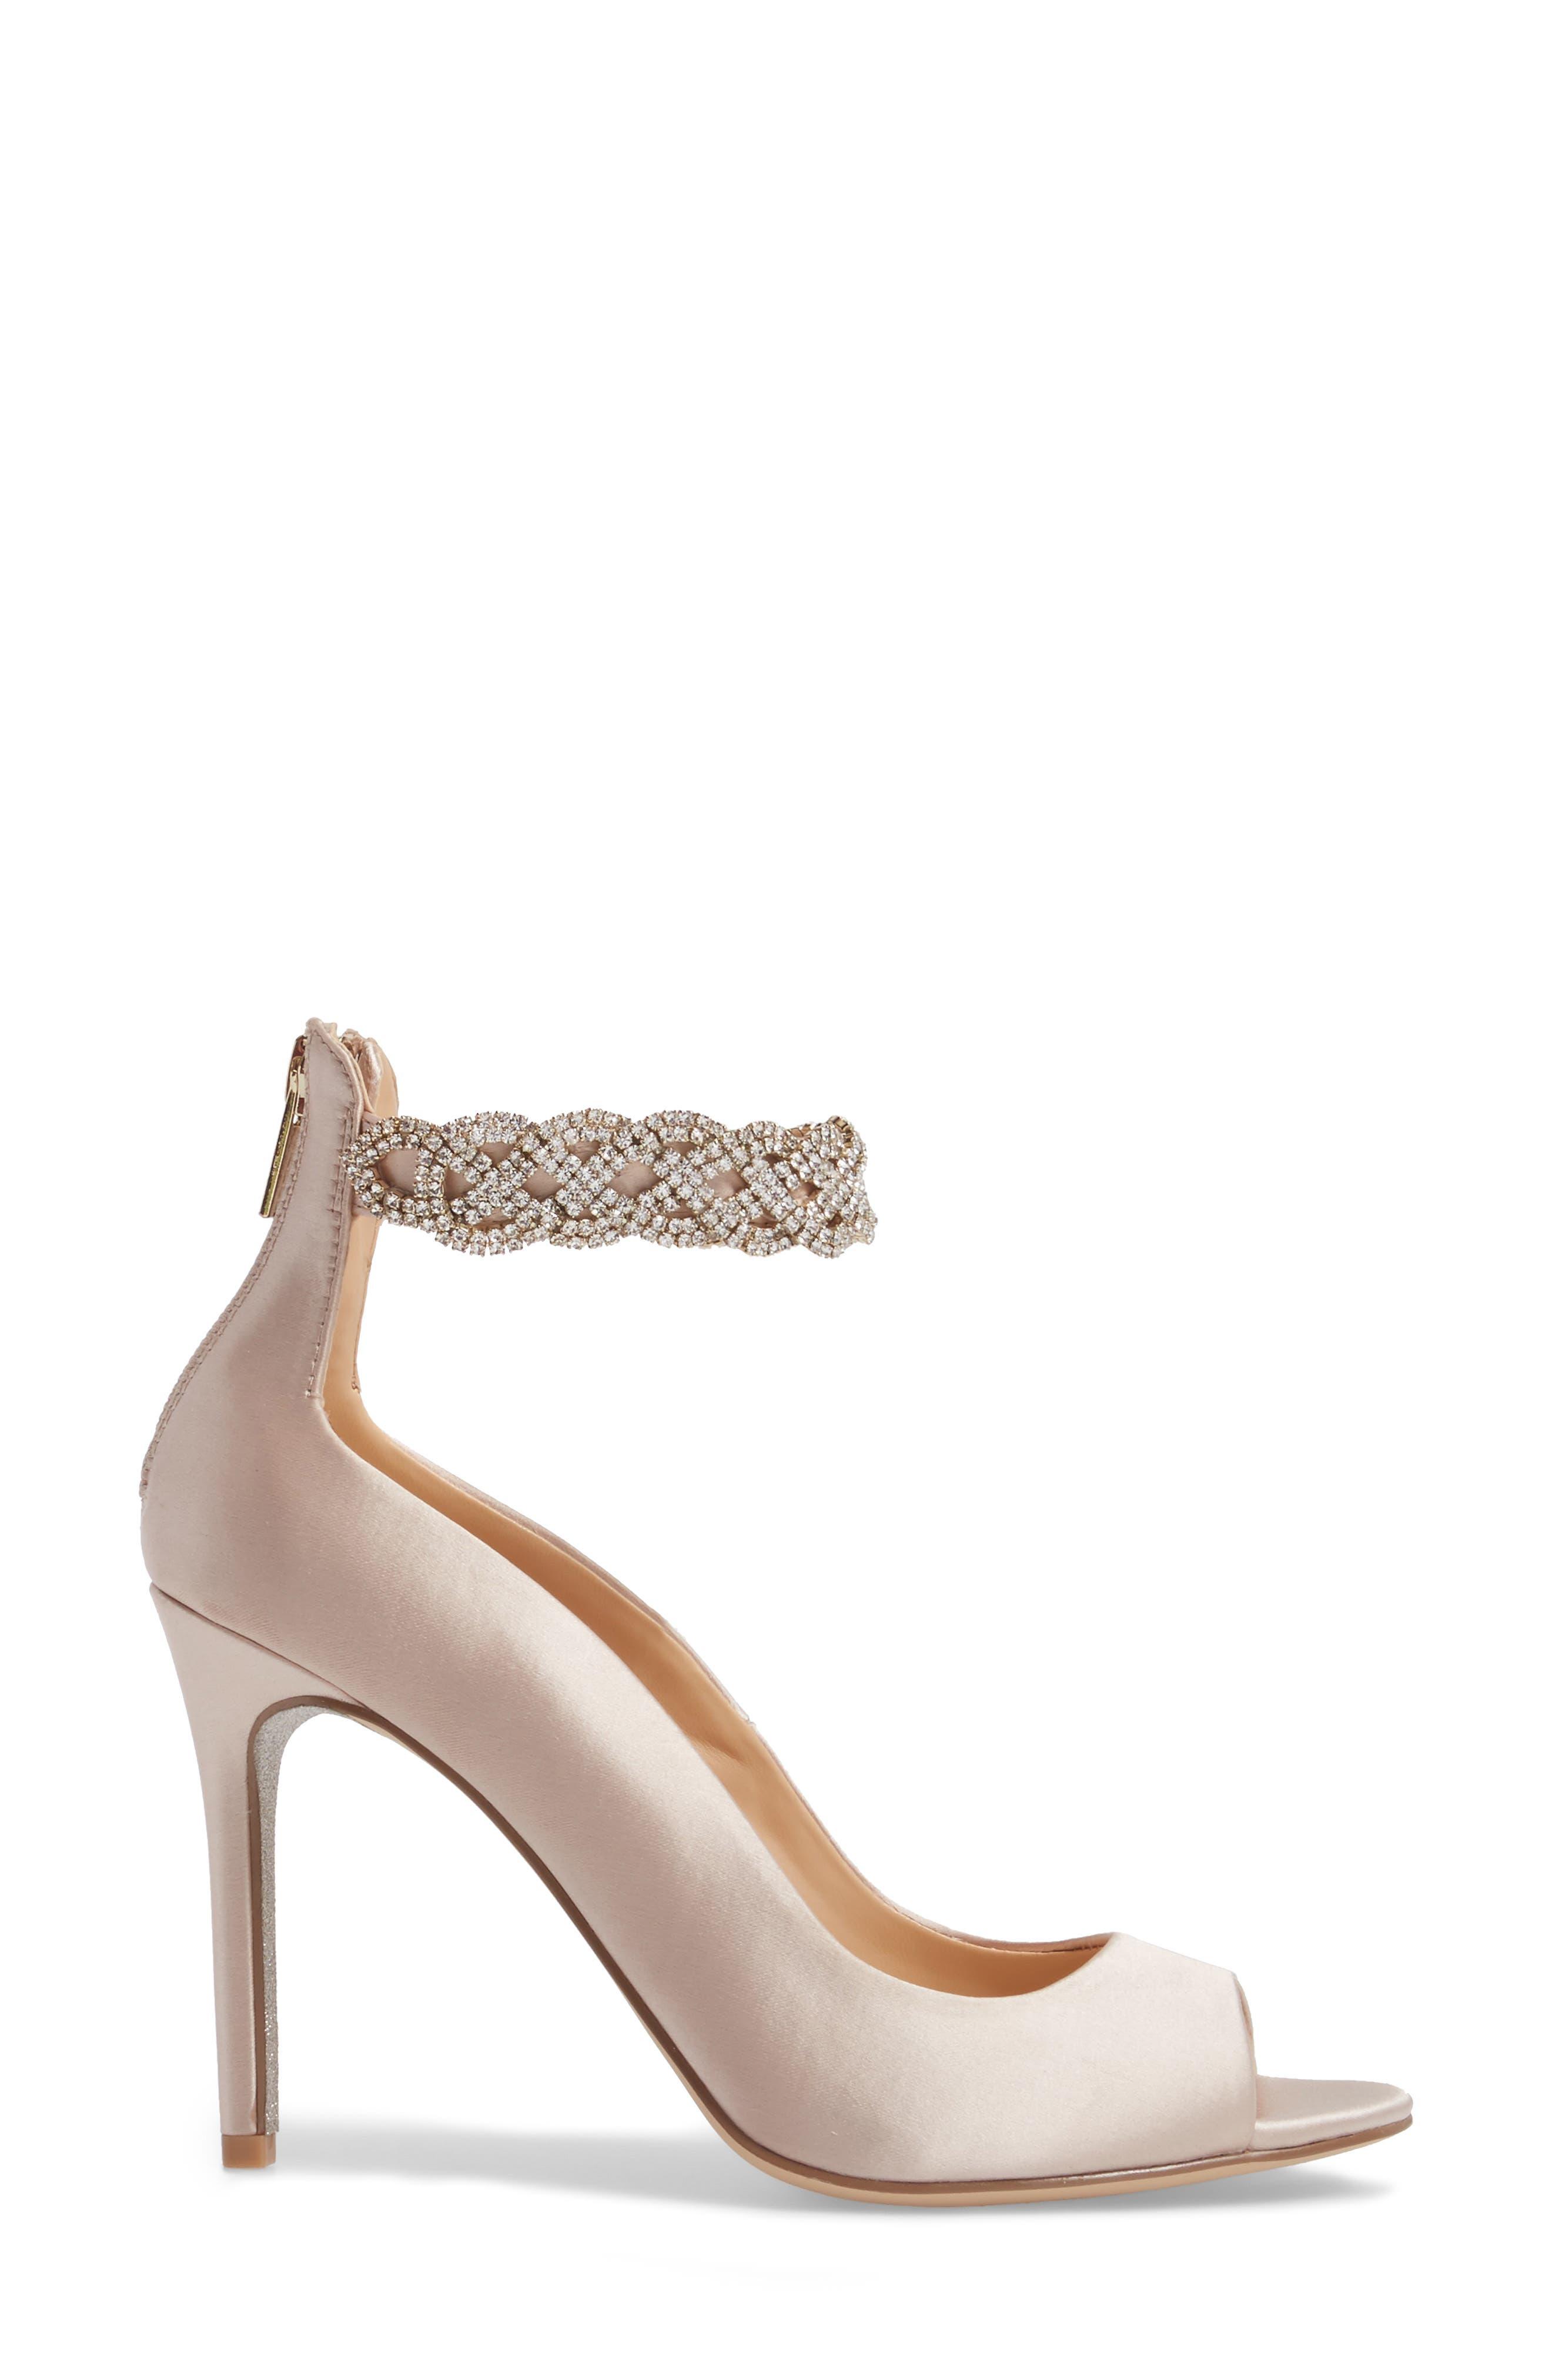 Alanis Embellished Ankle Strap Pump,                             Alternate thumbnail 3, color,                             Champagne Satin